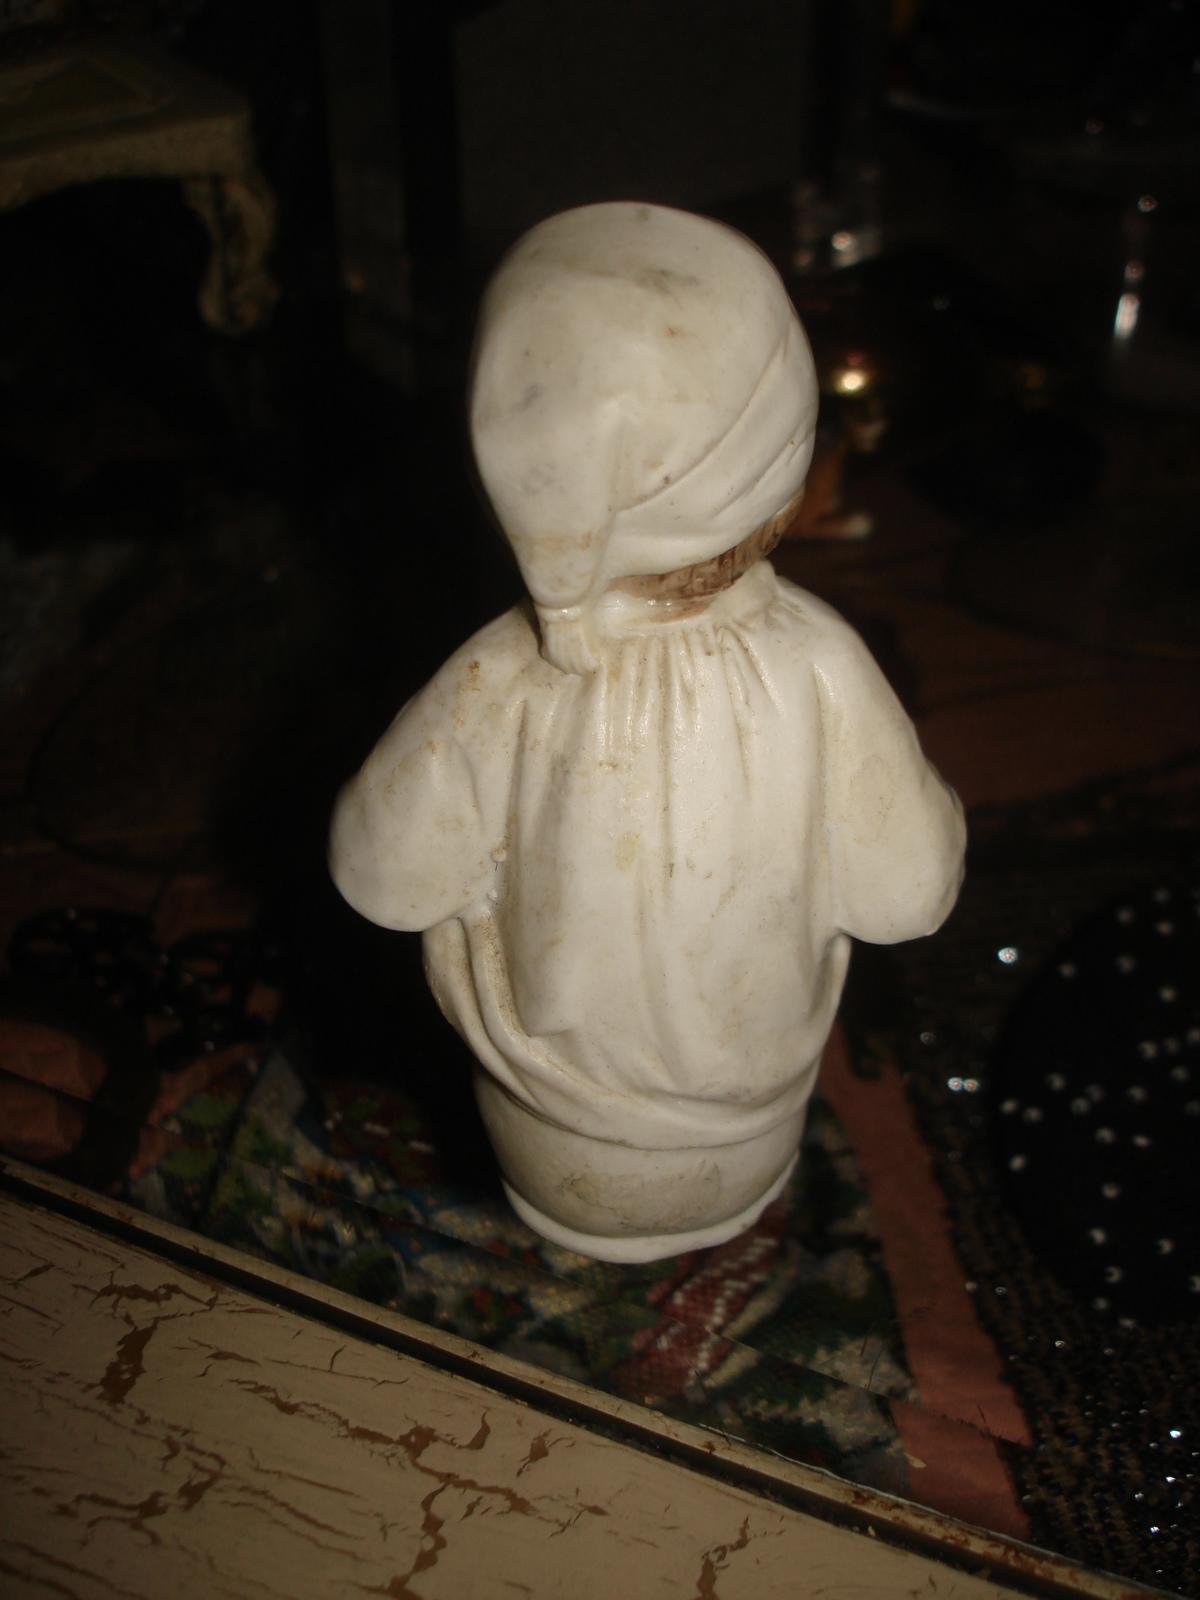 VTG VICTORIAN BISQUE BOY in NIGHT GOWN & CAP on POTTY CHAMBER POT FIGURINE